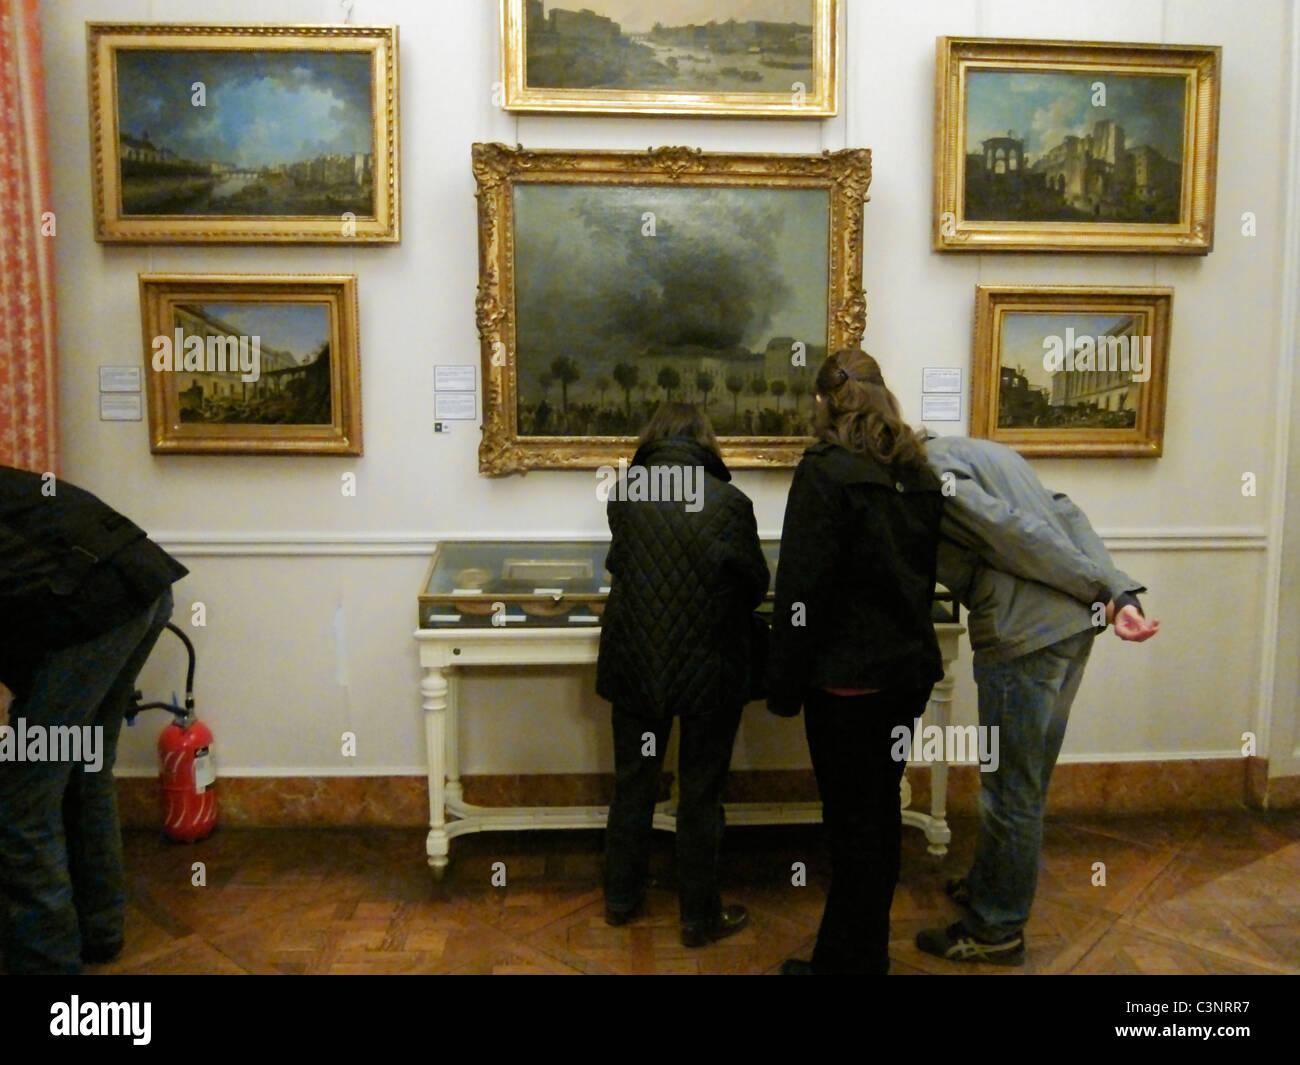 Paris, France, People Looking Visiting 'Musee Carnavalet', 'Musee de l'Histoire', City of Paris - Stock Image